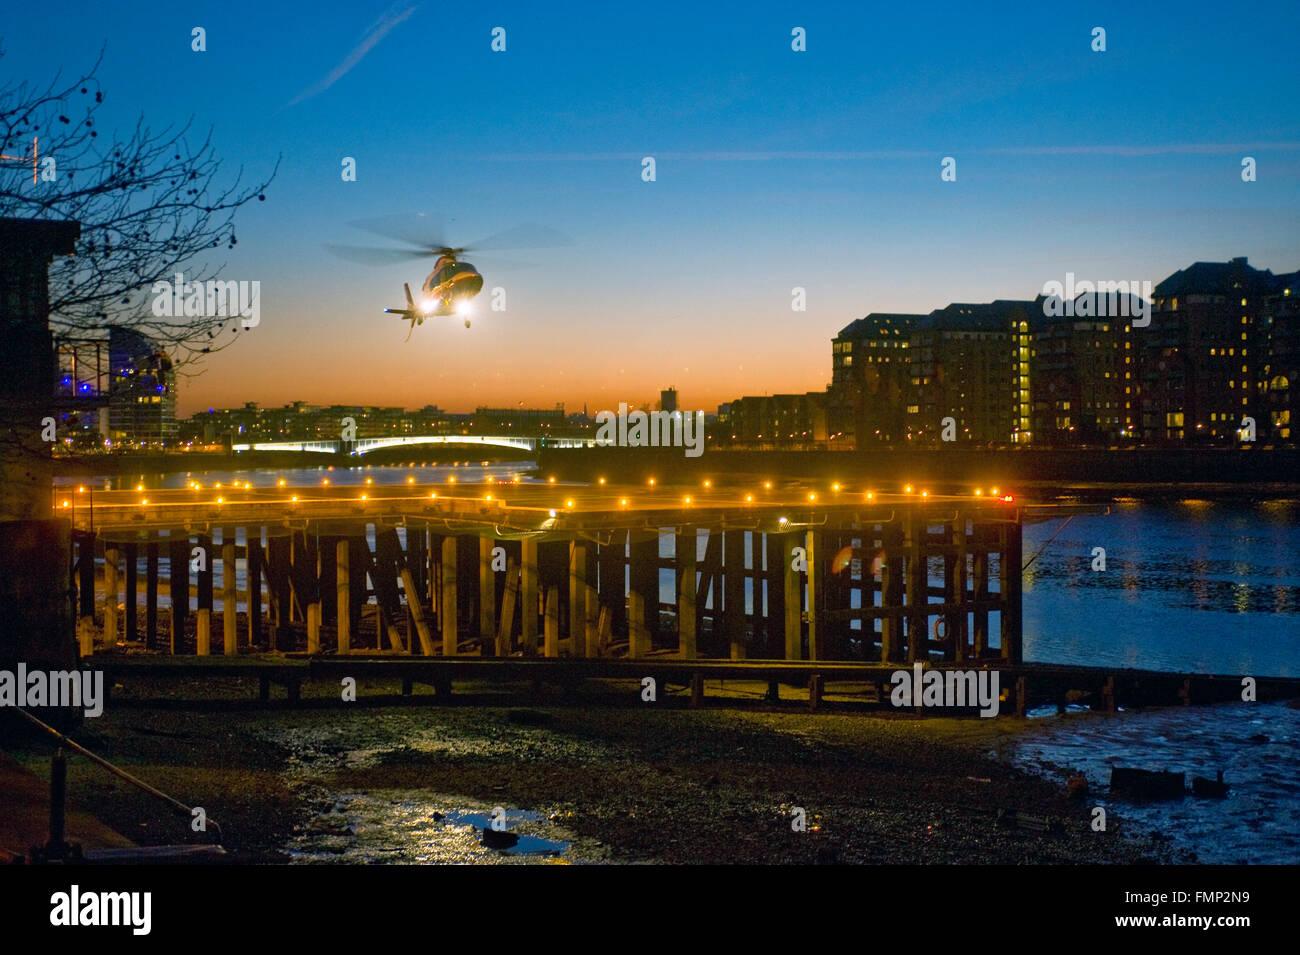 Battersea Heliport - Stock Image